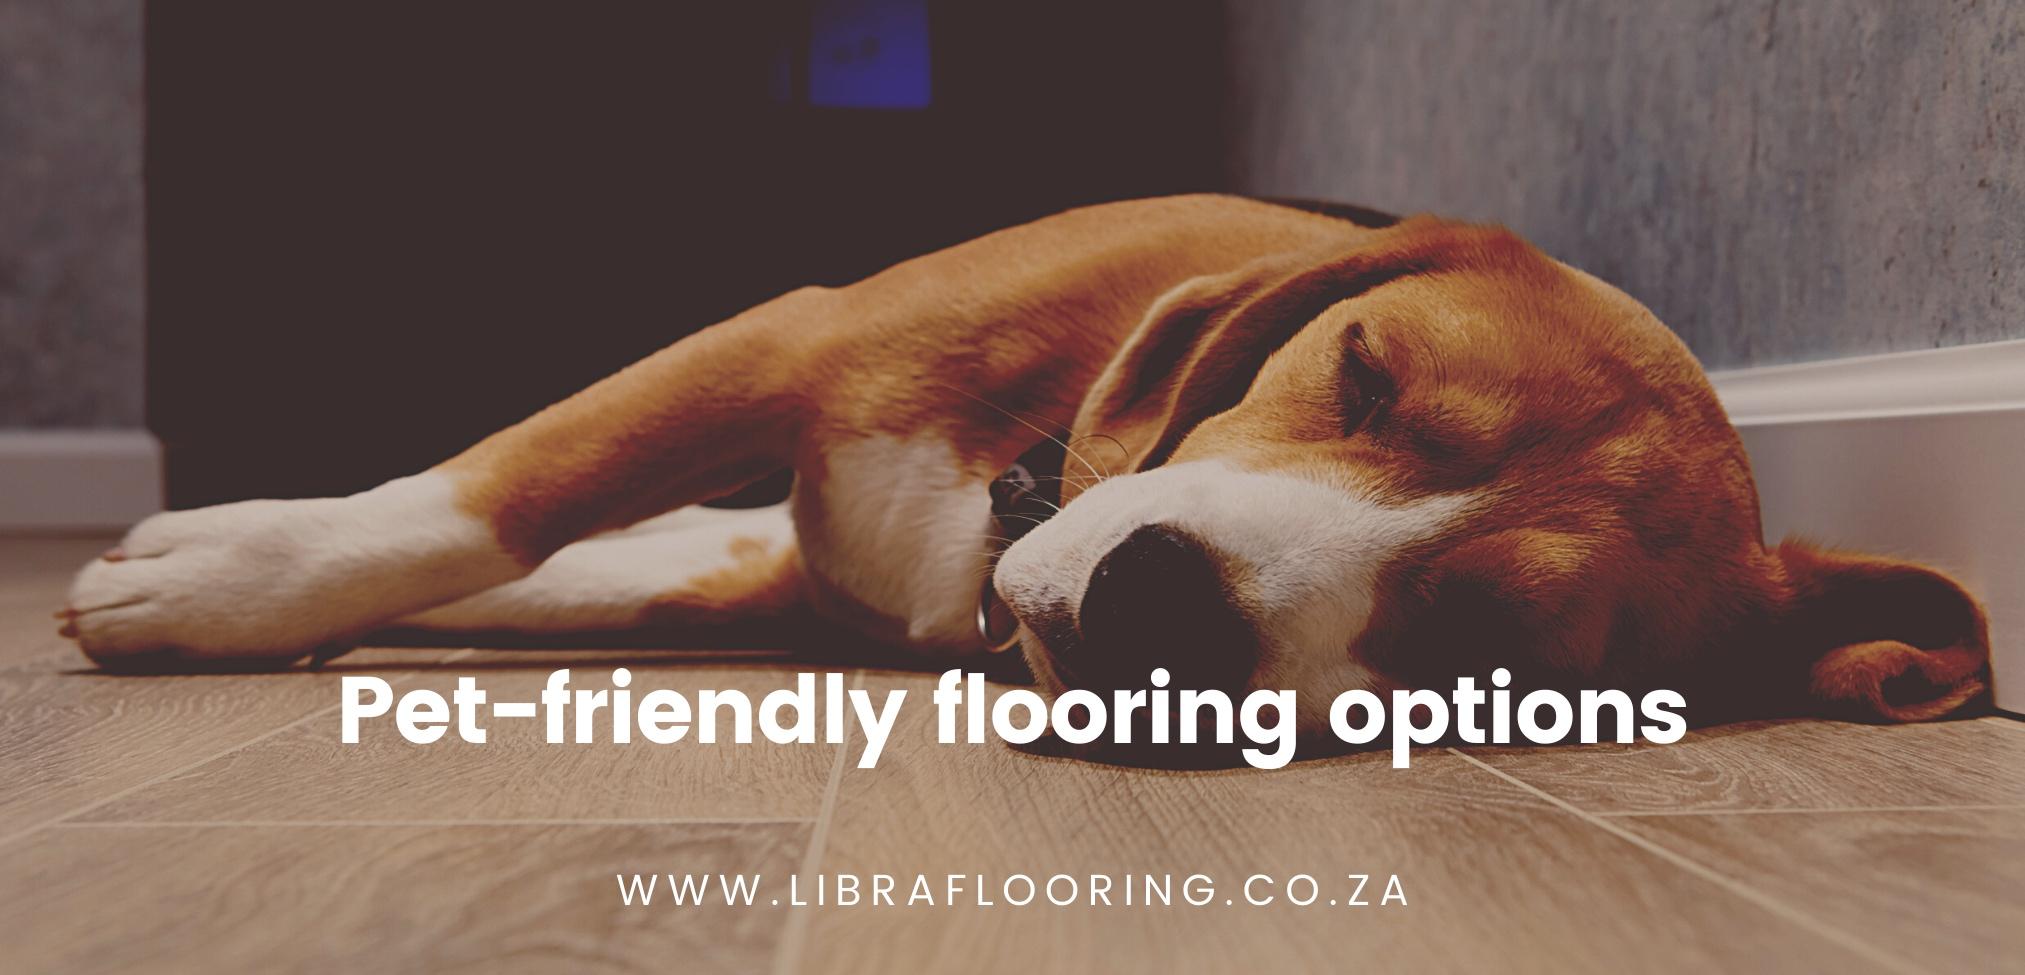 Pet-friendly flooring option